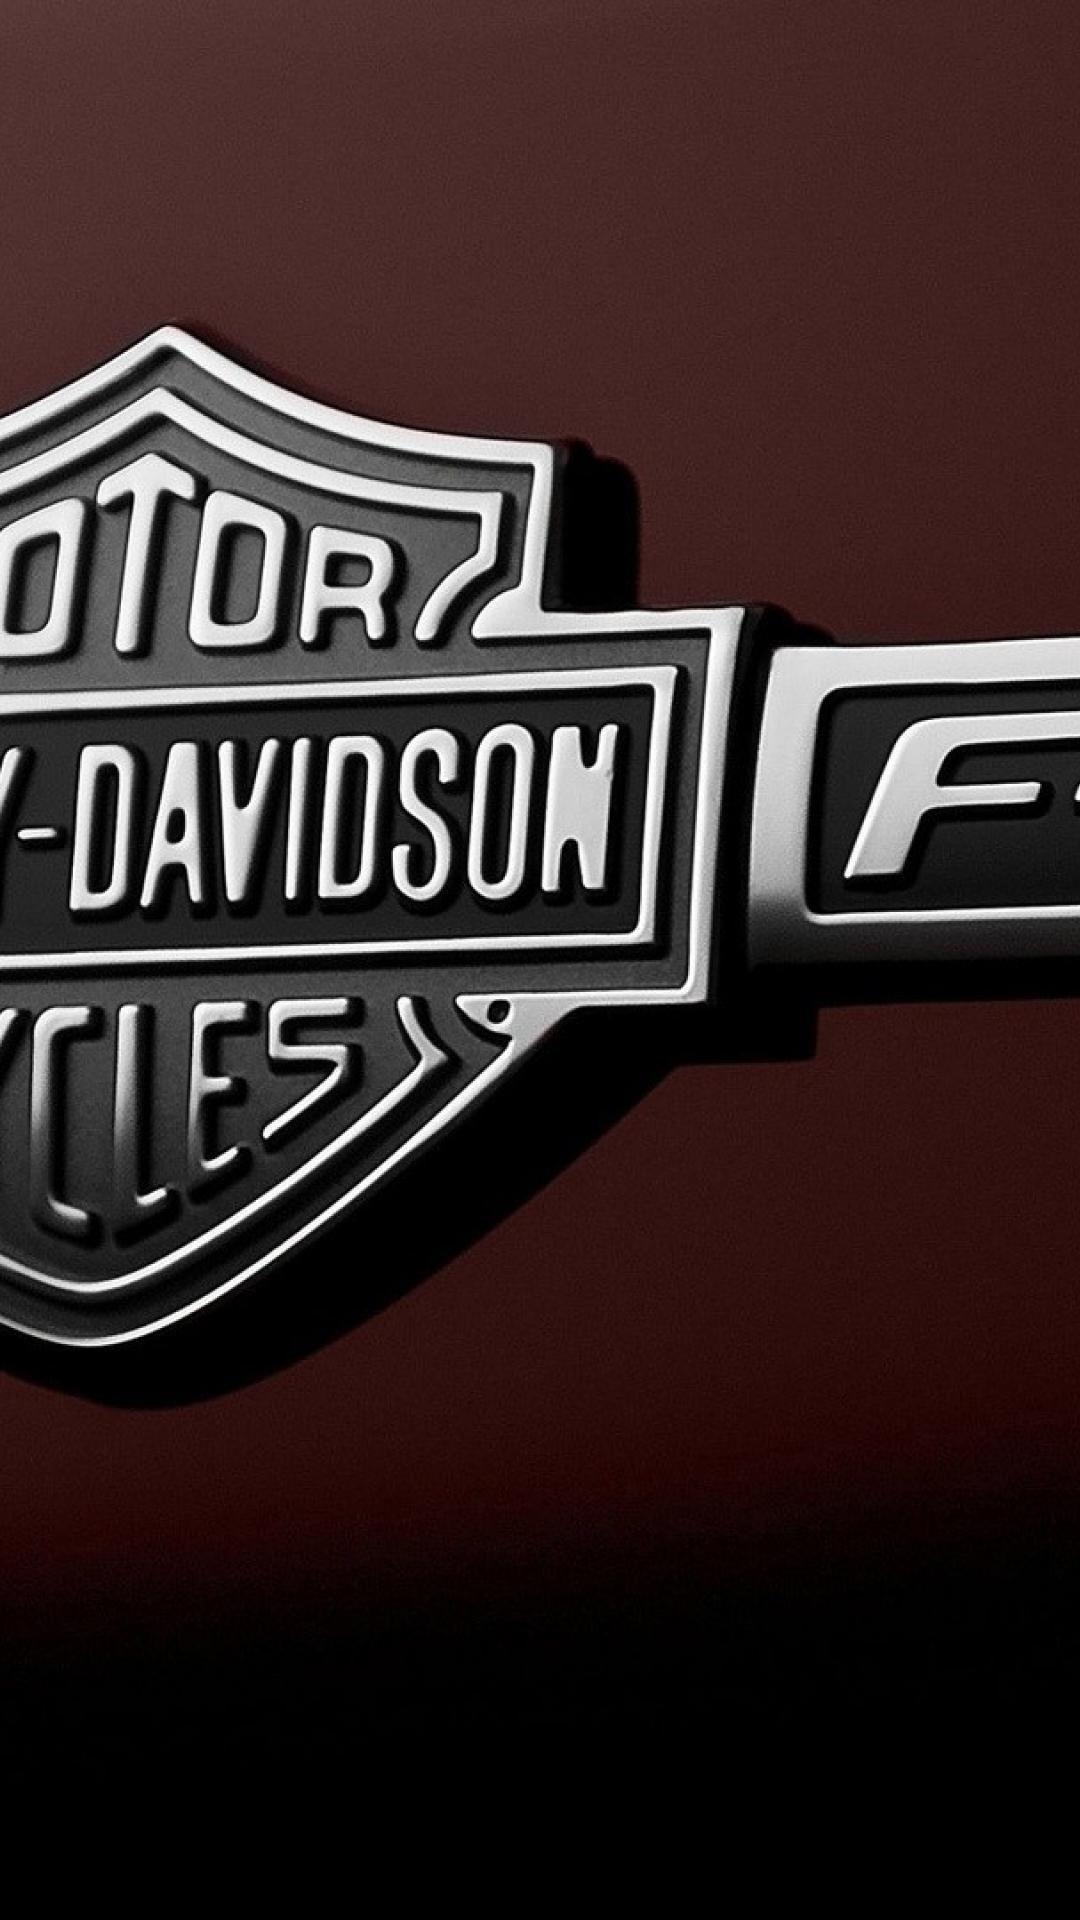 Logo Harley Davidson Phone Wallpaper In 2020 Harley Davidson Wallpaper Android Wallpaper Harley Davidson